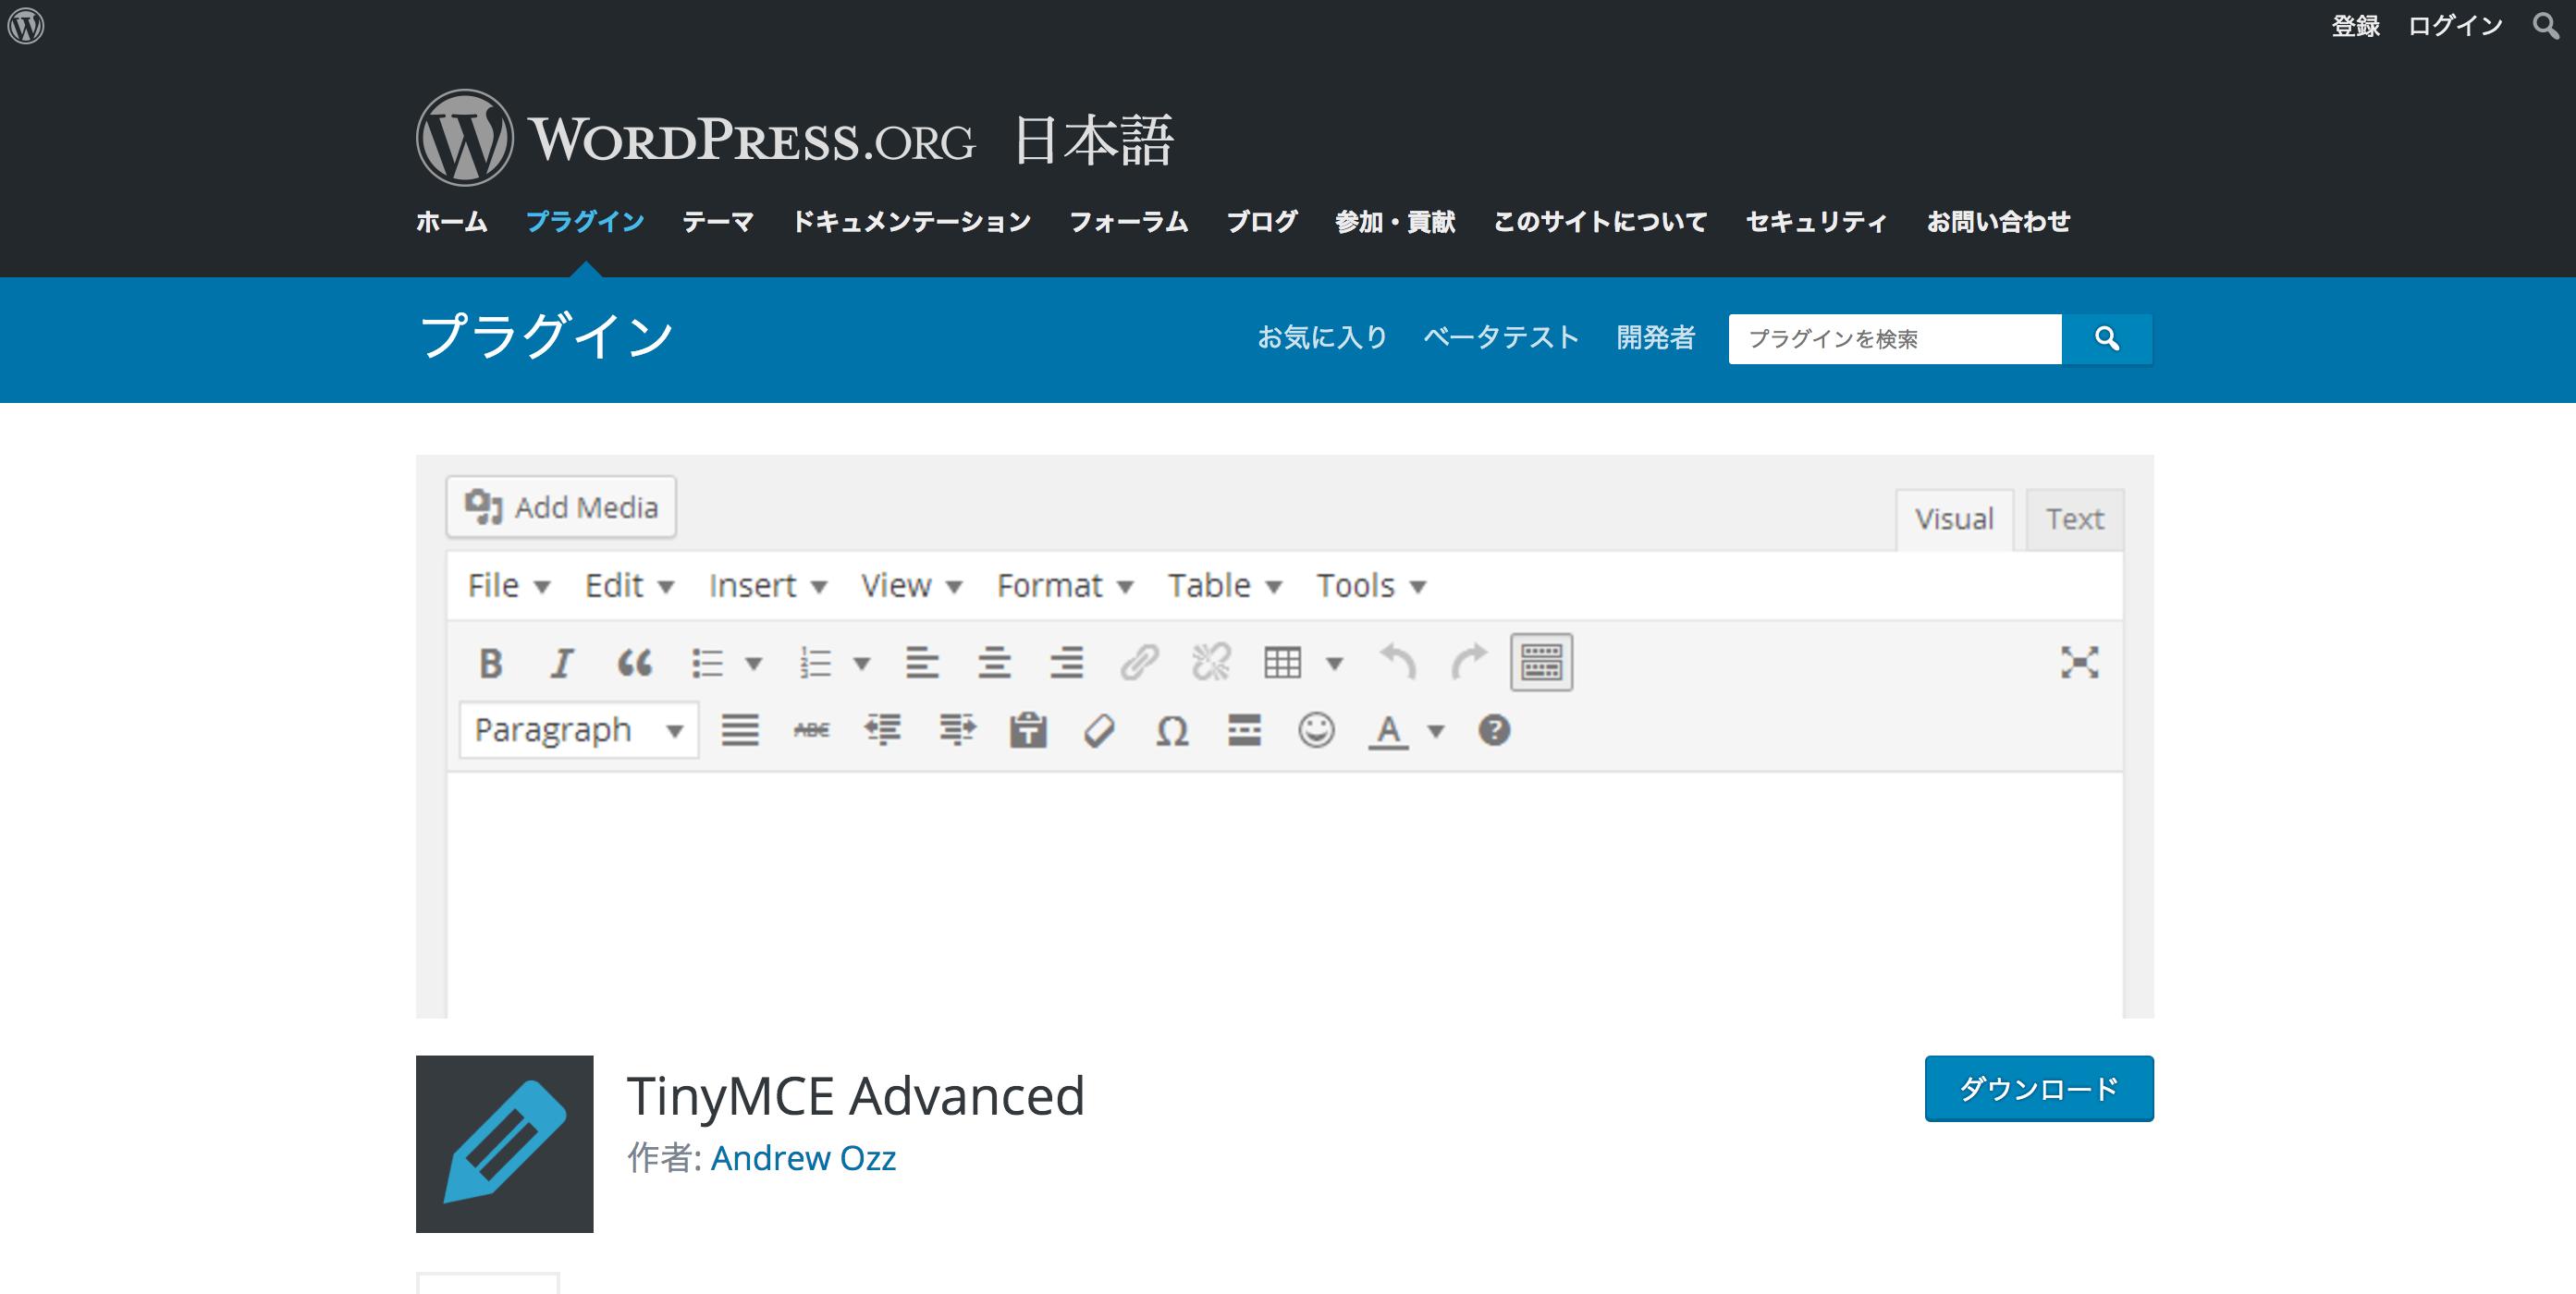 Tiny - WordPress初心者がseo対策でやるべき設定方法まとめ